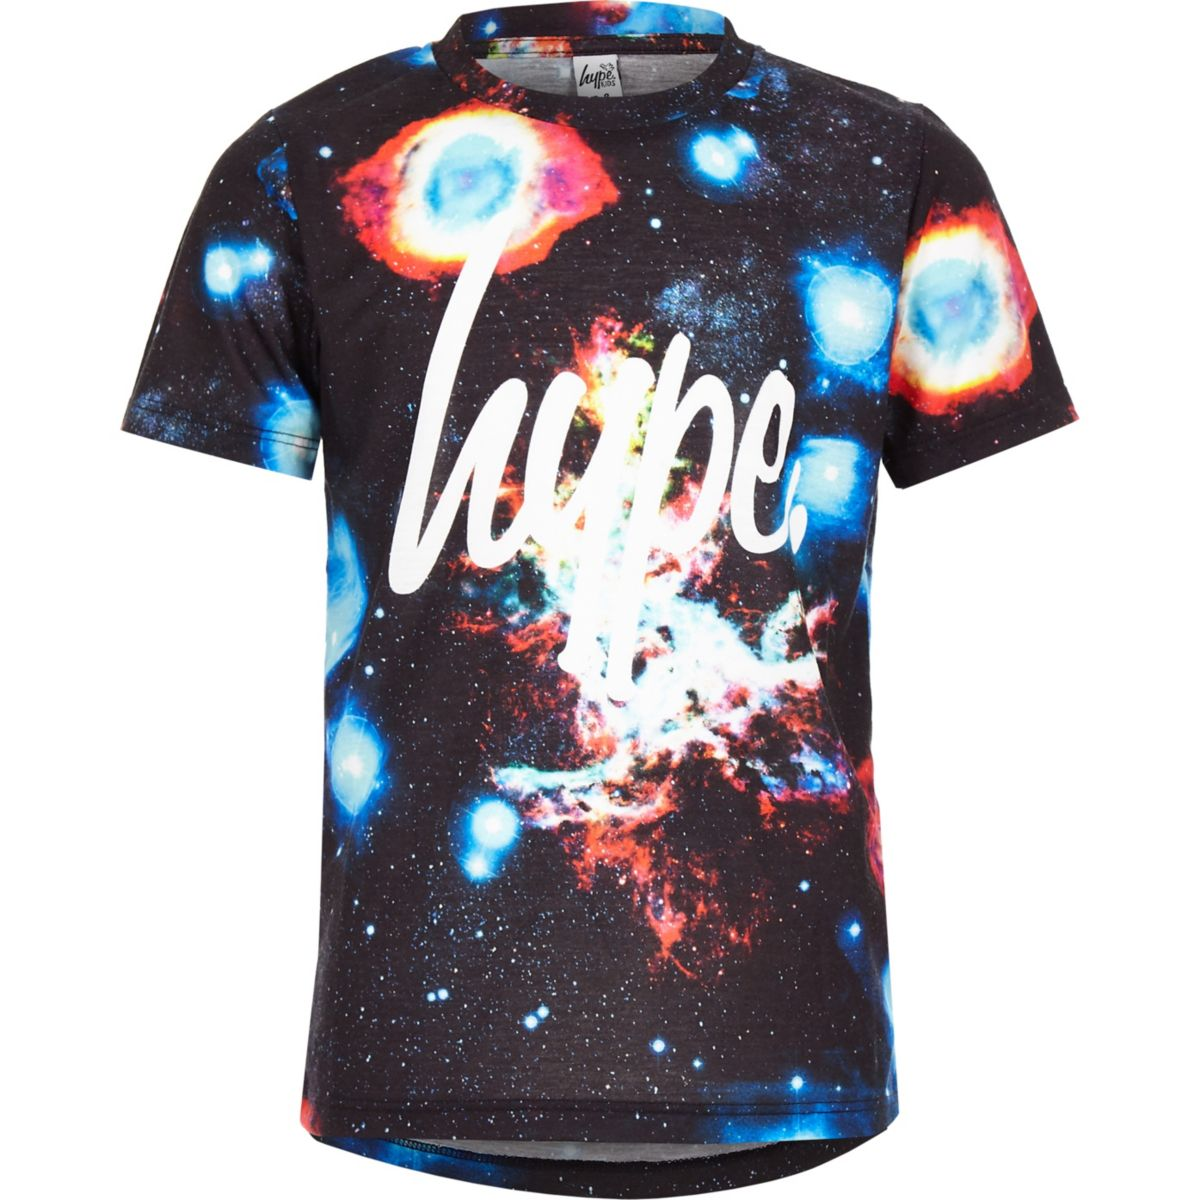 Boys Hype navy space T-shirt